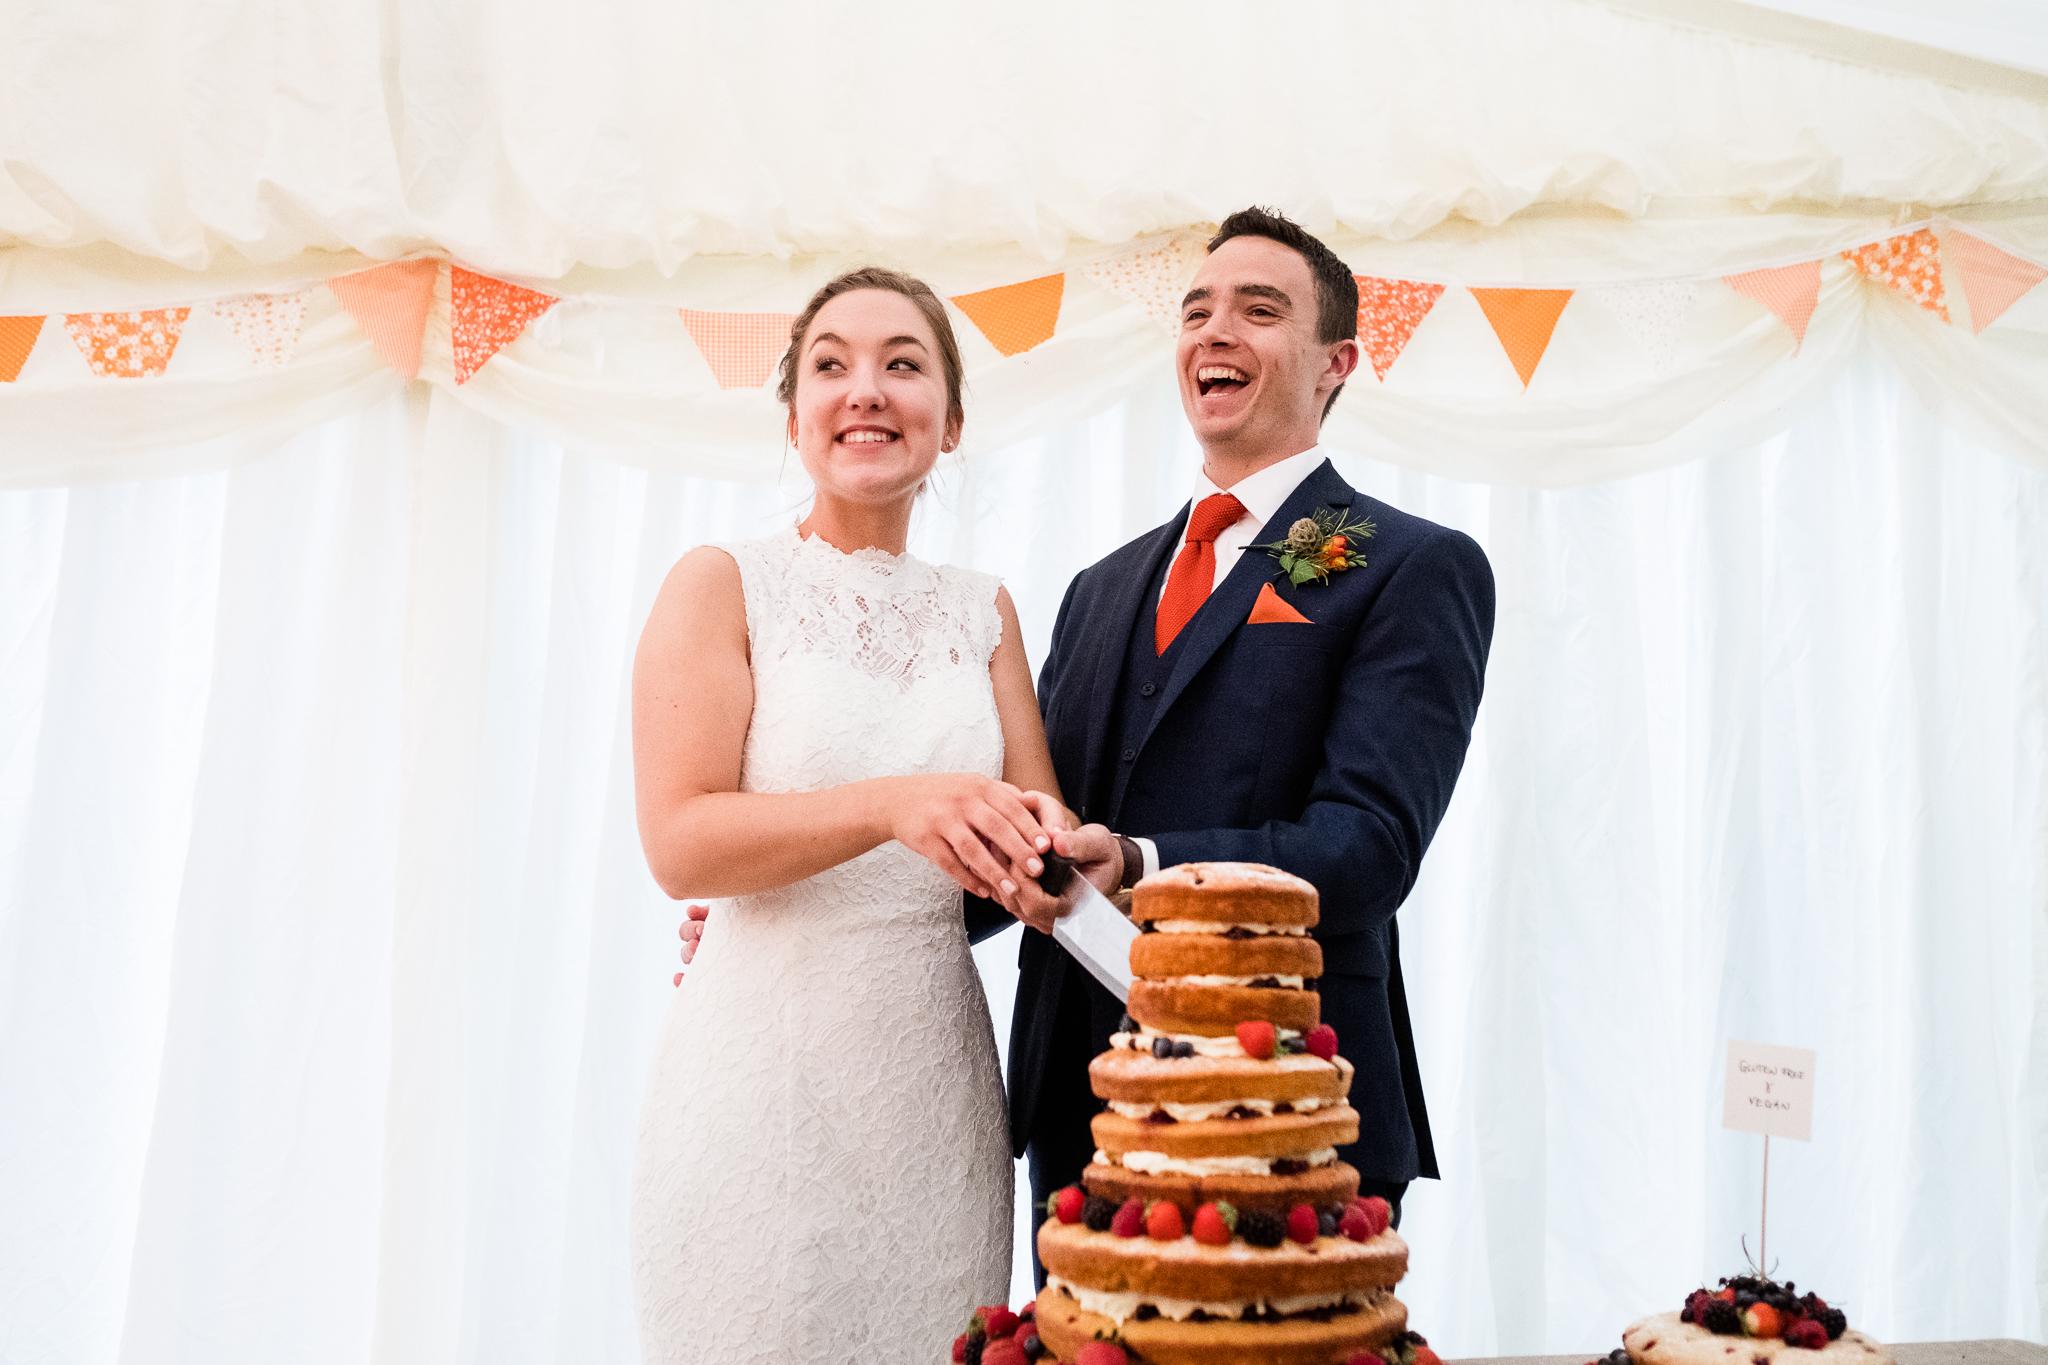 Relaxed Documentary Wedding Photography at The Wizard Inn, Alderley Edge Cheshire - Jenny Harper-76.jpg